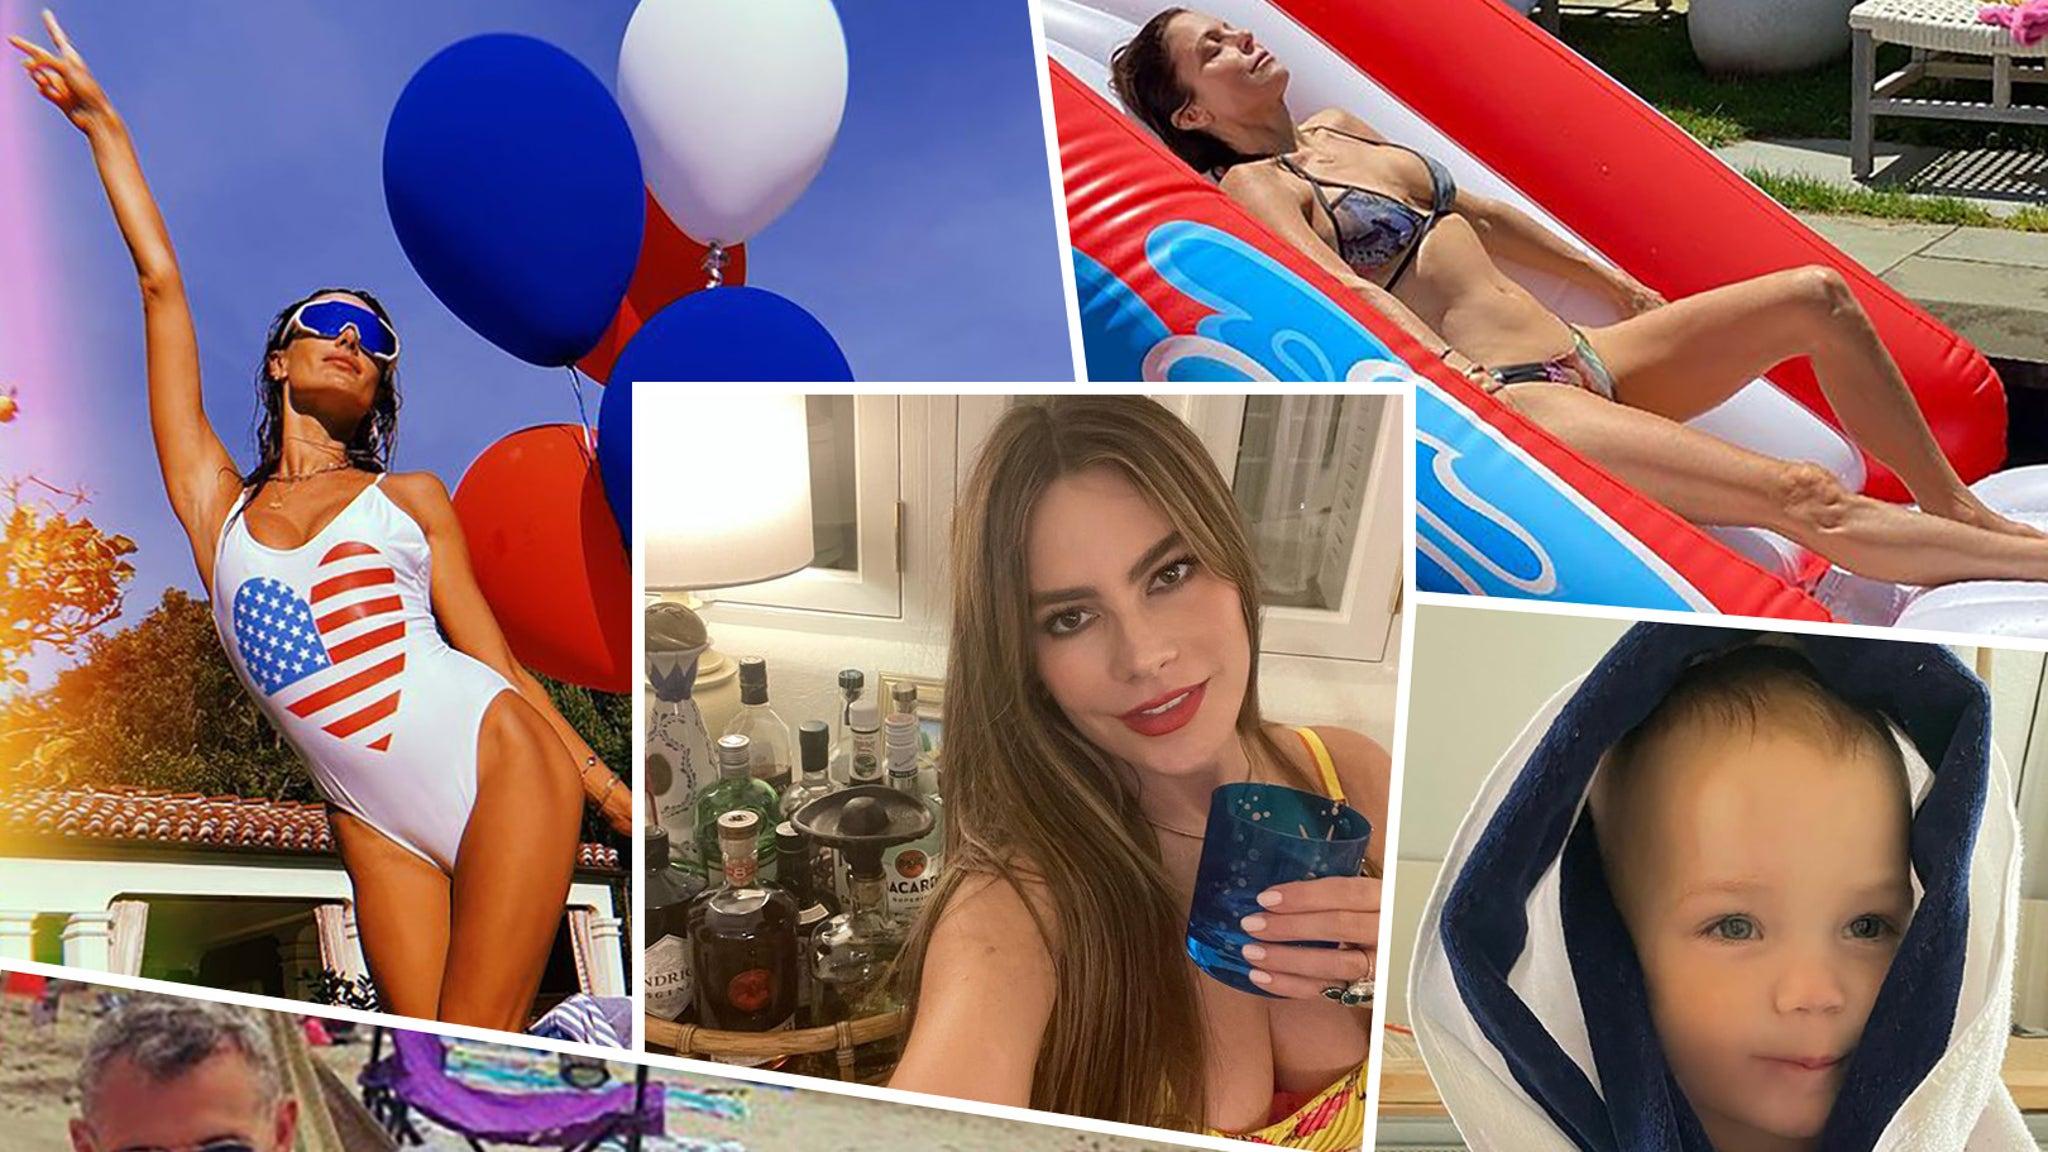 Beach, girls and bikinis: how Hollywood celebrated on July 4, 2021